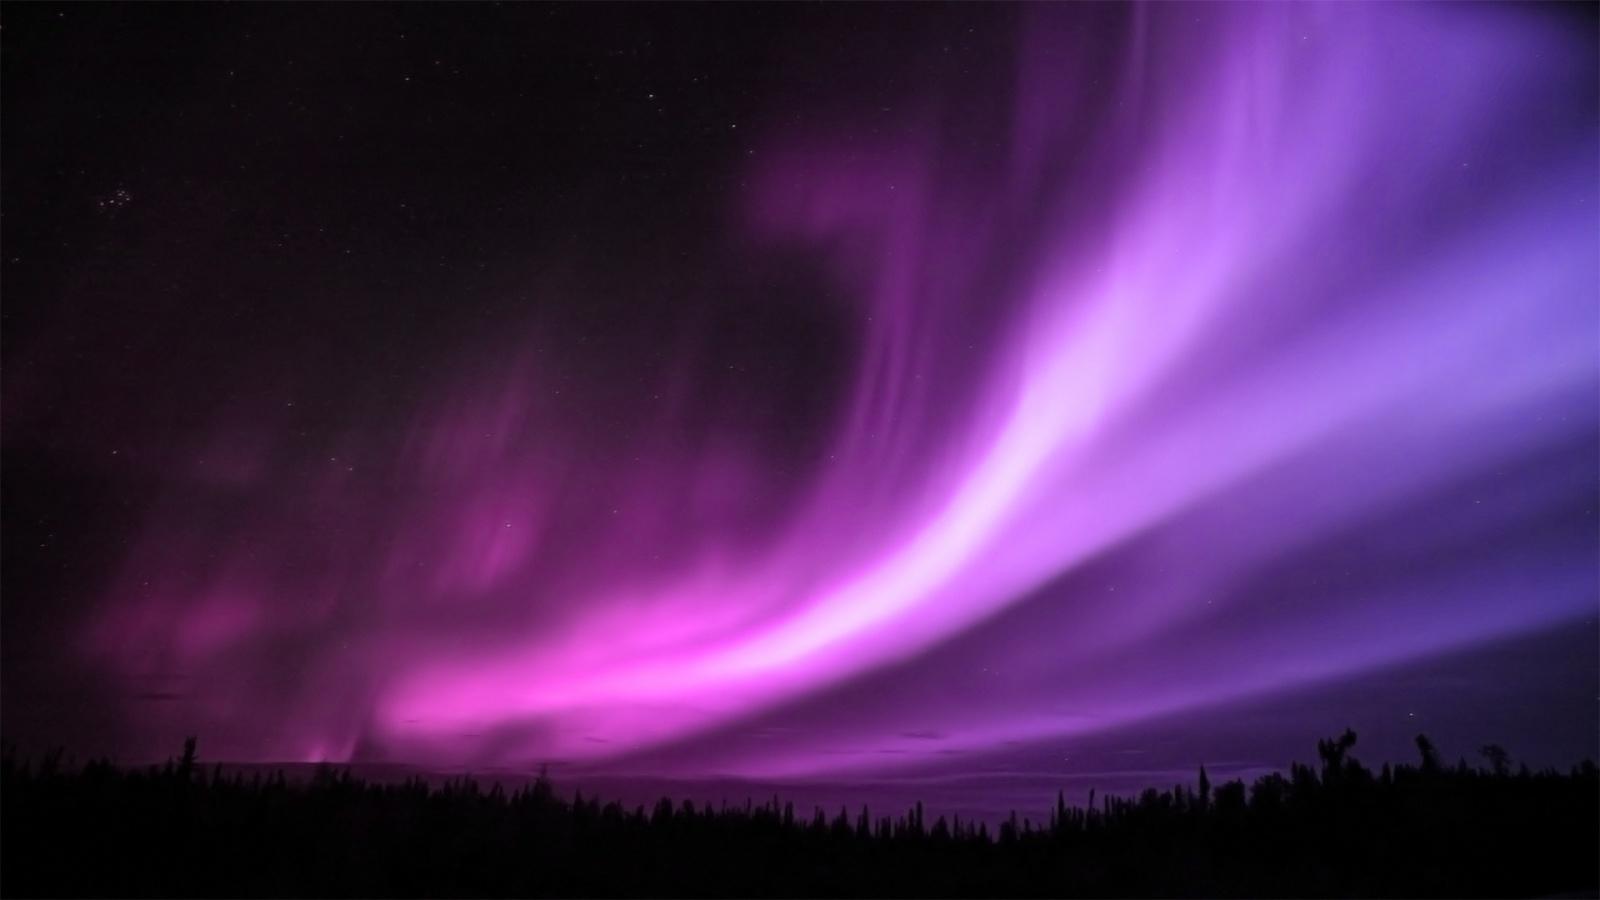 Purple Aurora Borealis Wallpapers HD Wallpapers 1600x900